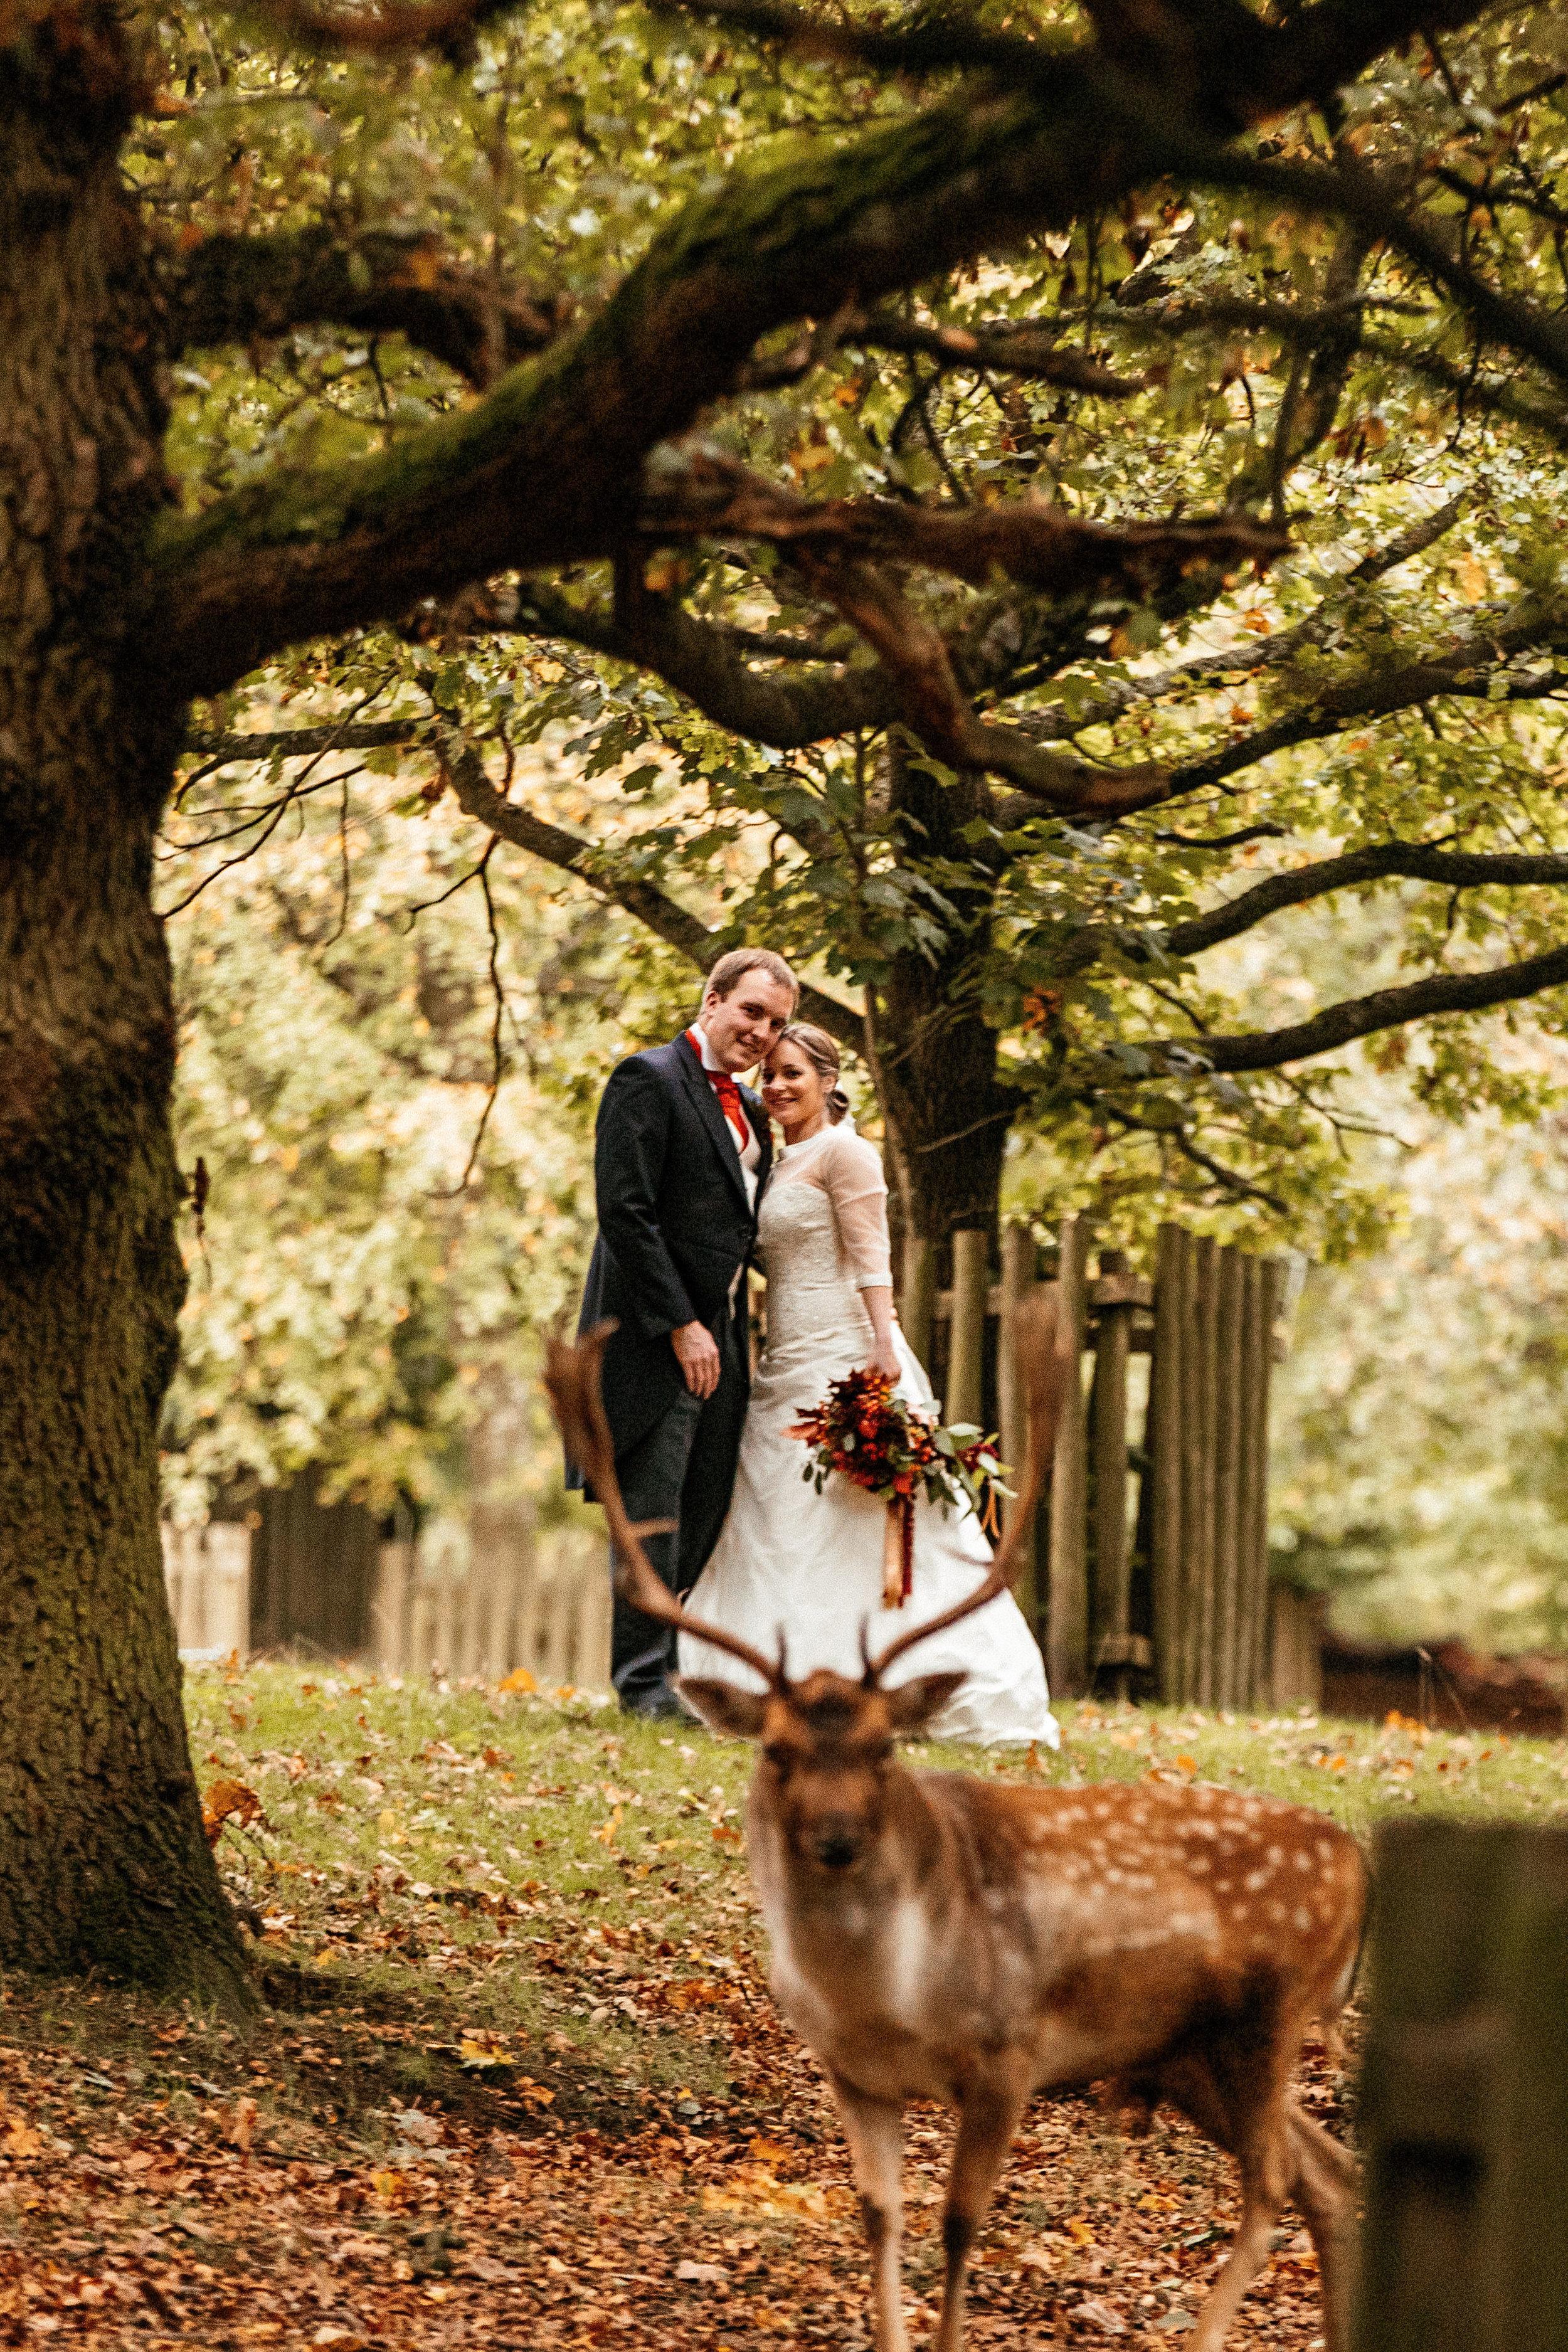 Dunham-Massey-Wedding-Photographer-91.jpg